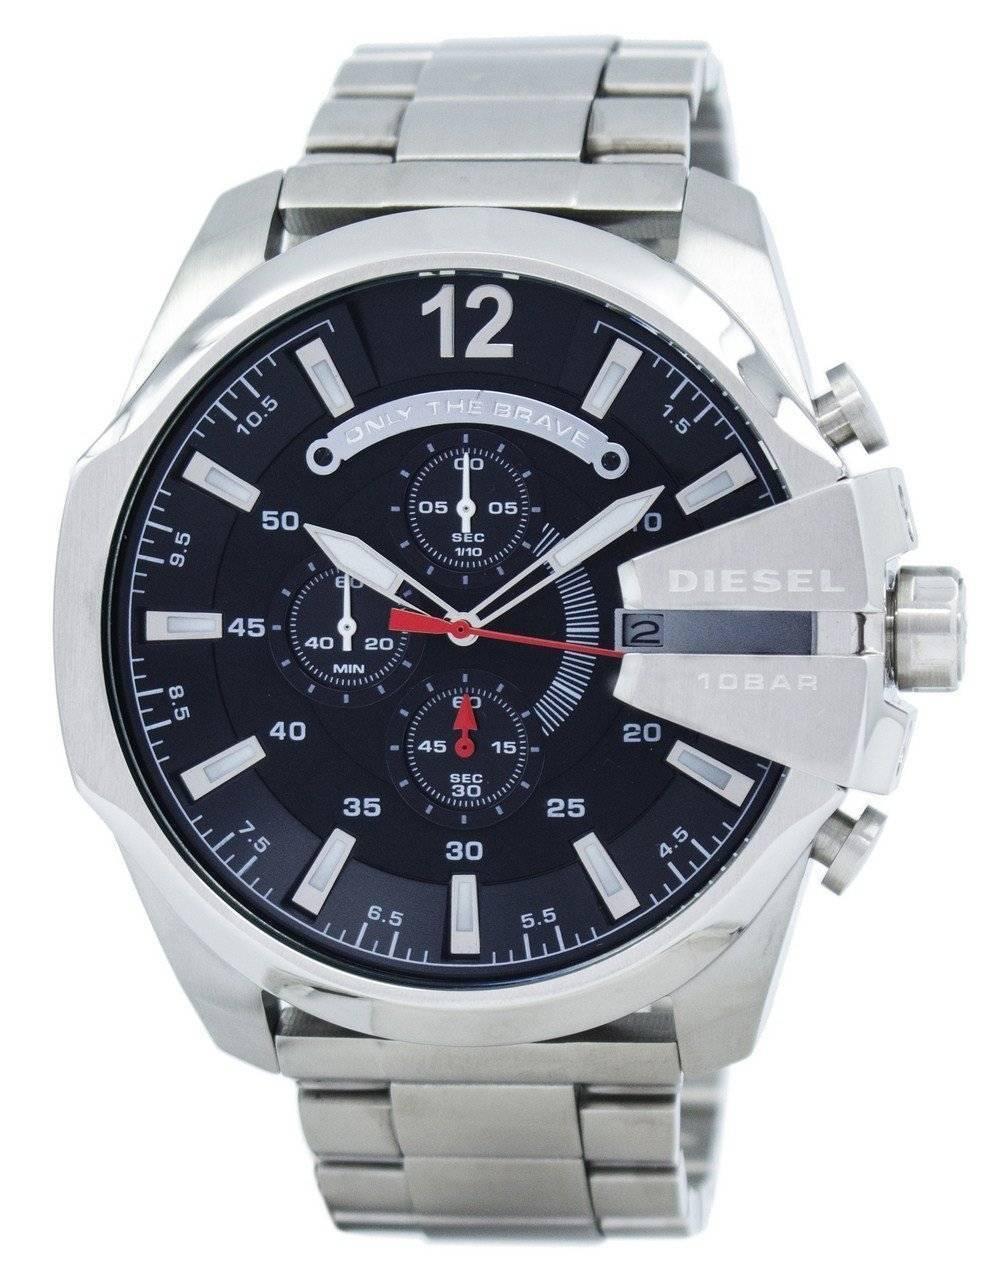 7c33cd9ed546 Diesel Mega Chief Cuarzo Cronógrafo Negro Dial DZ4308 Reloj para hombre